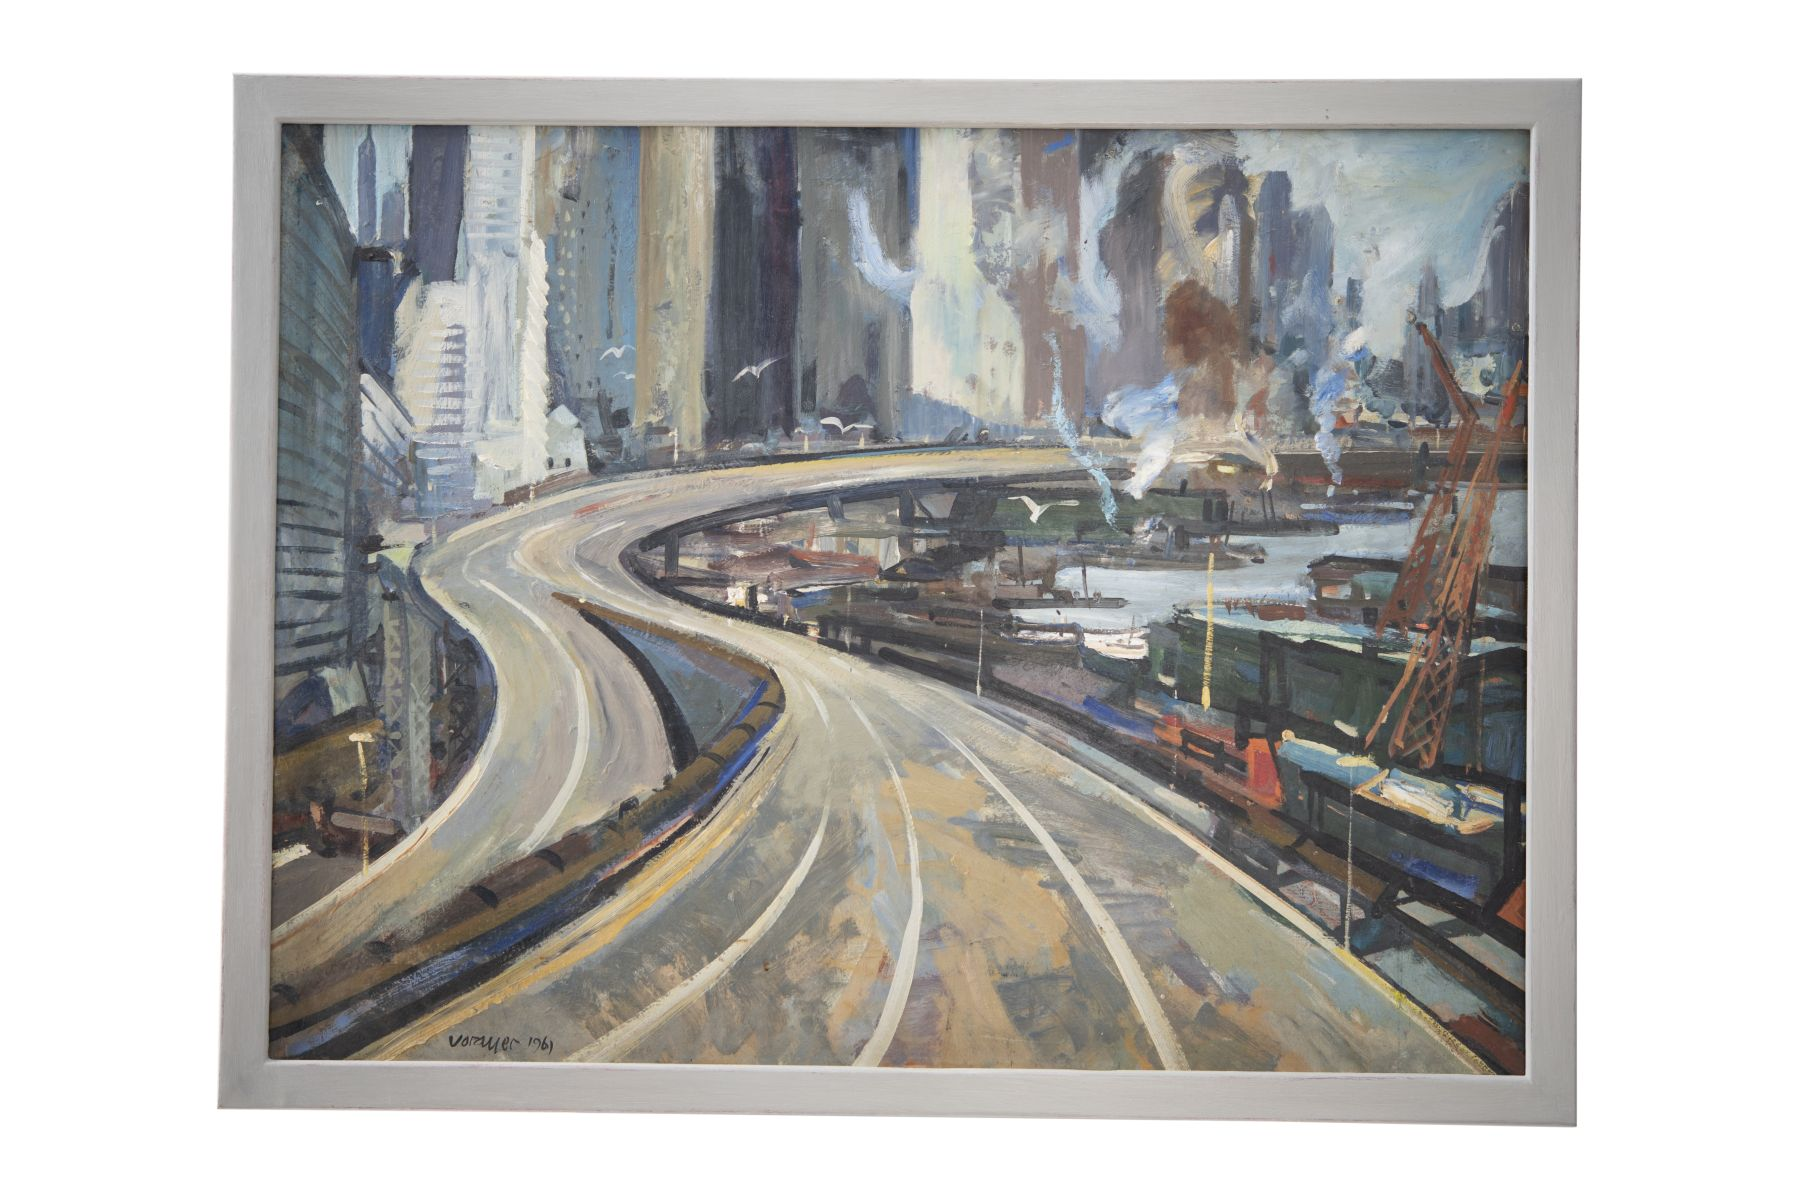 "#157 Anton Vorauer ""Eastriver"" 1961 | Anton Vorauer ""East River"" 1961 Image"